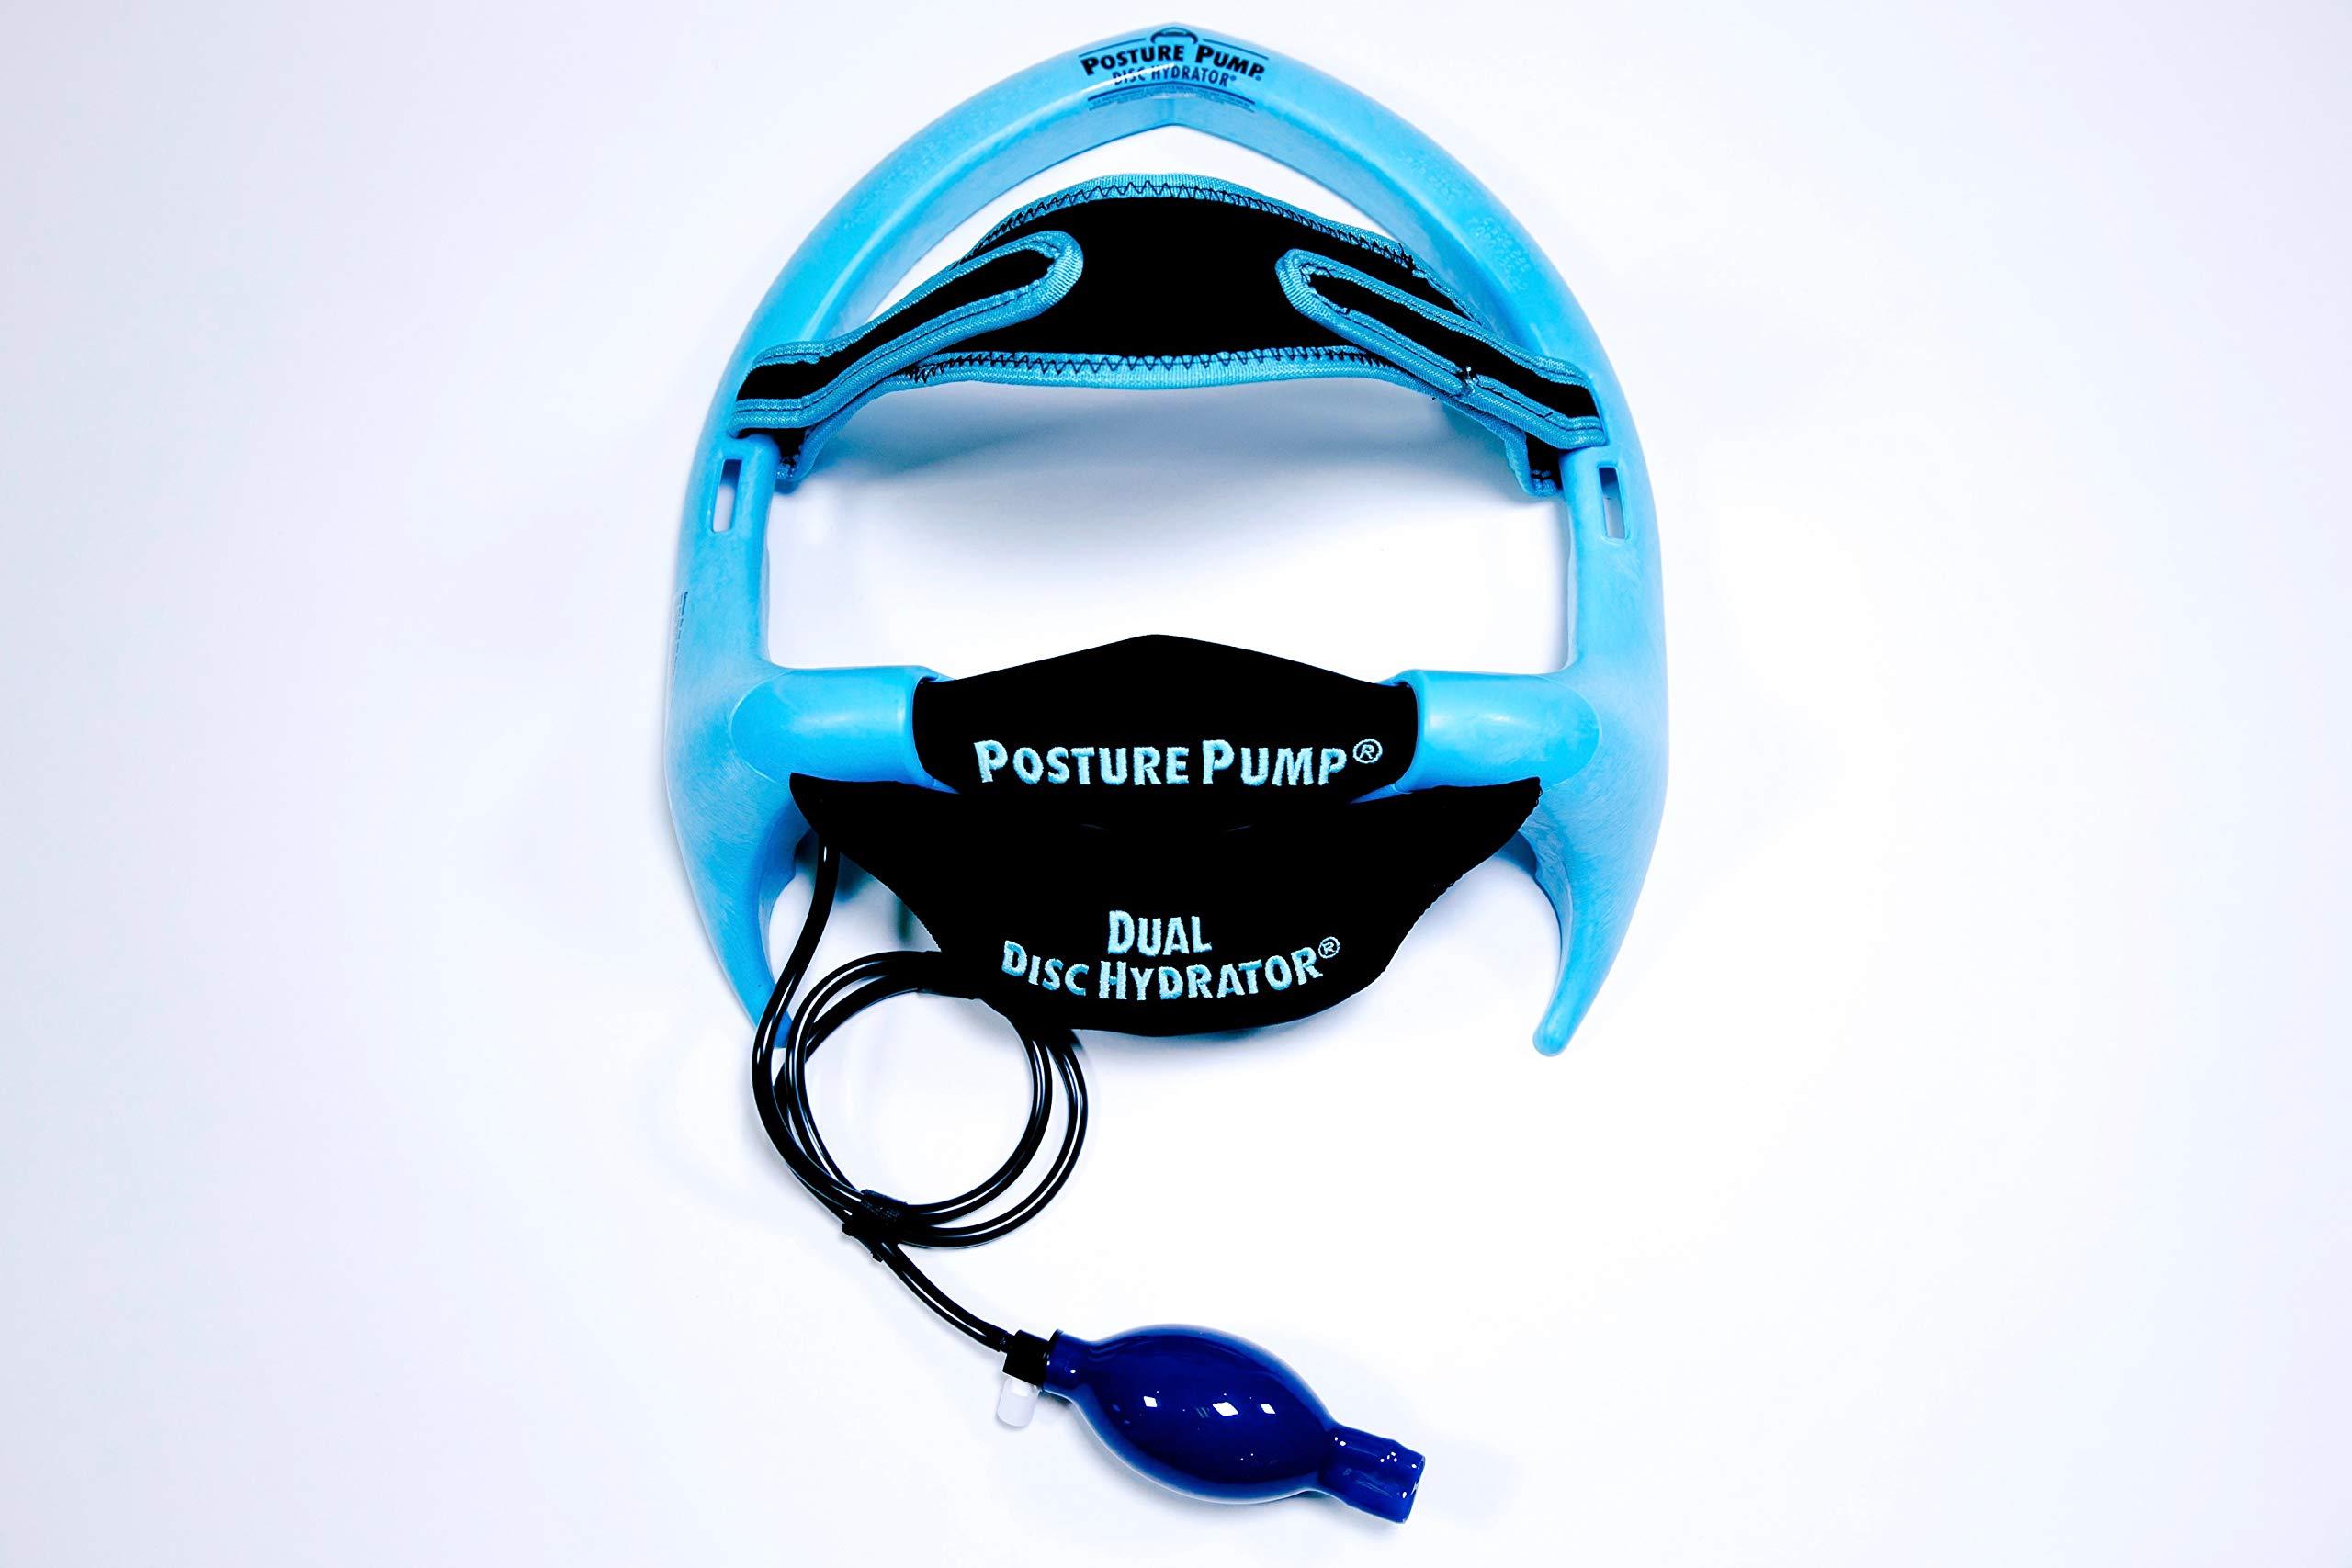 Posture Pump® 1400-D (Dual Disc Hydrator®) by Posture Pump (Image #4)